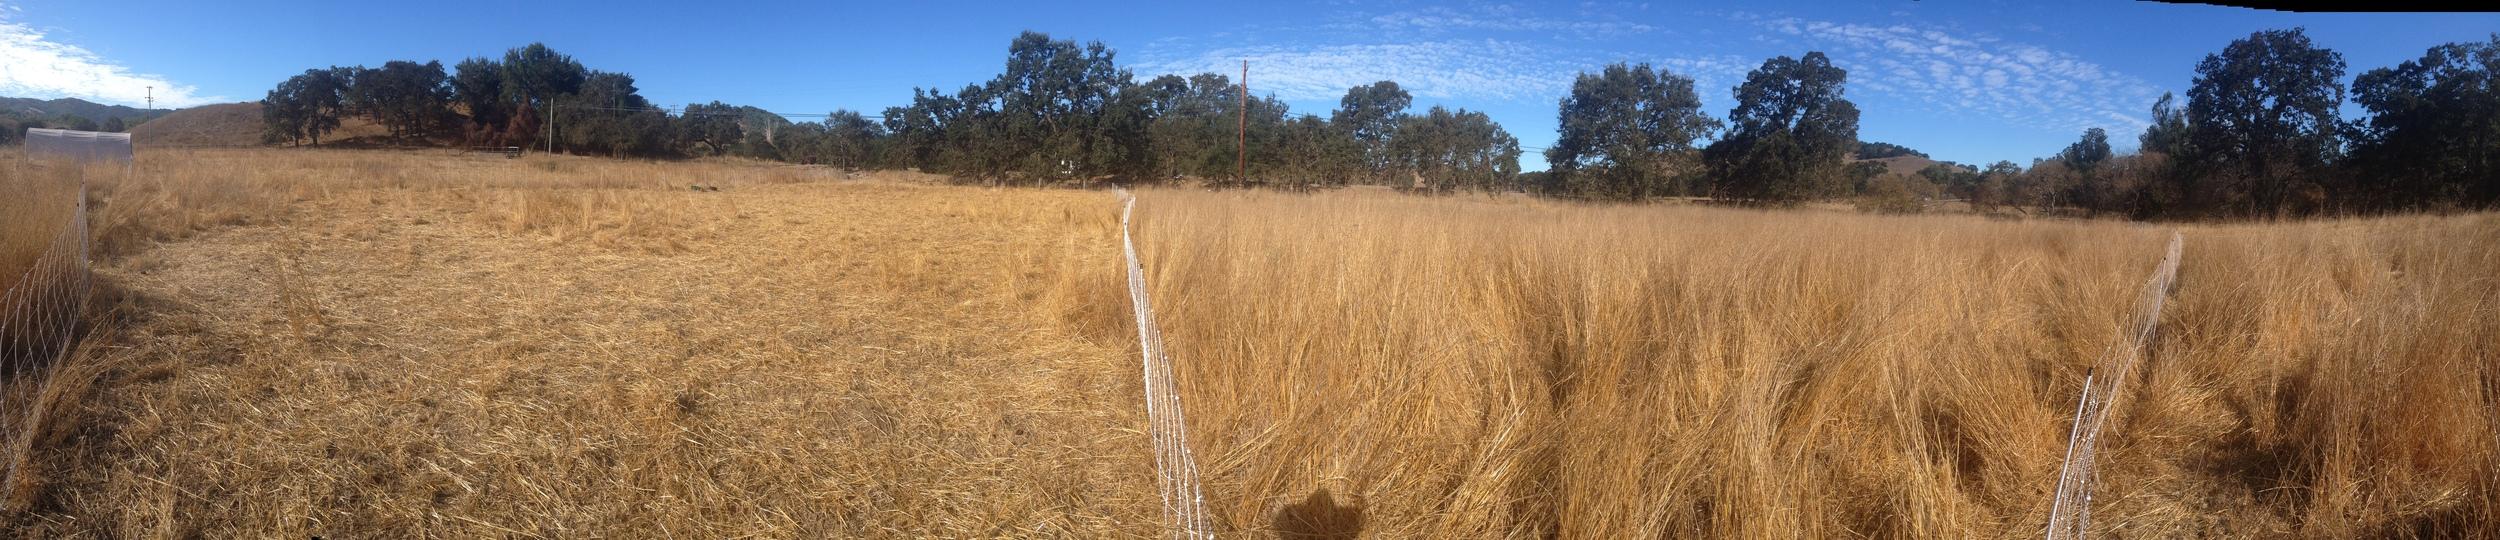 Pano_dry_grass.JPG